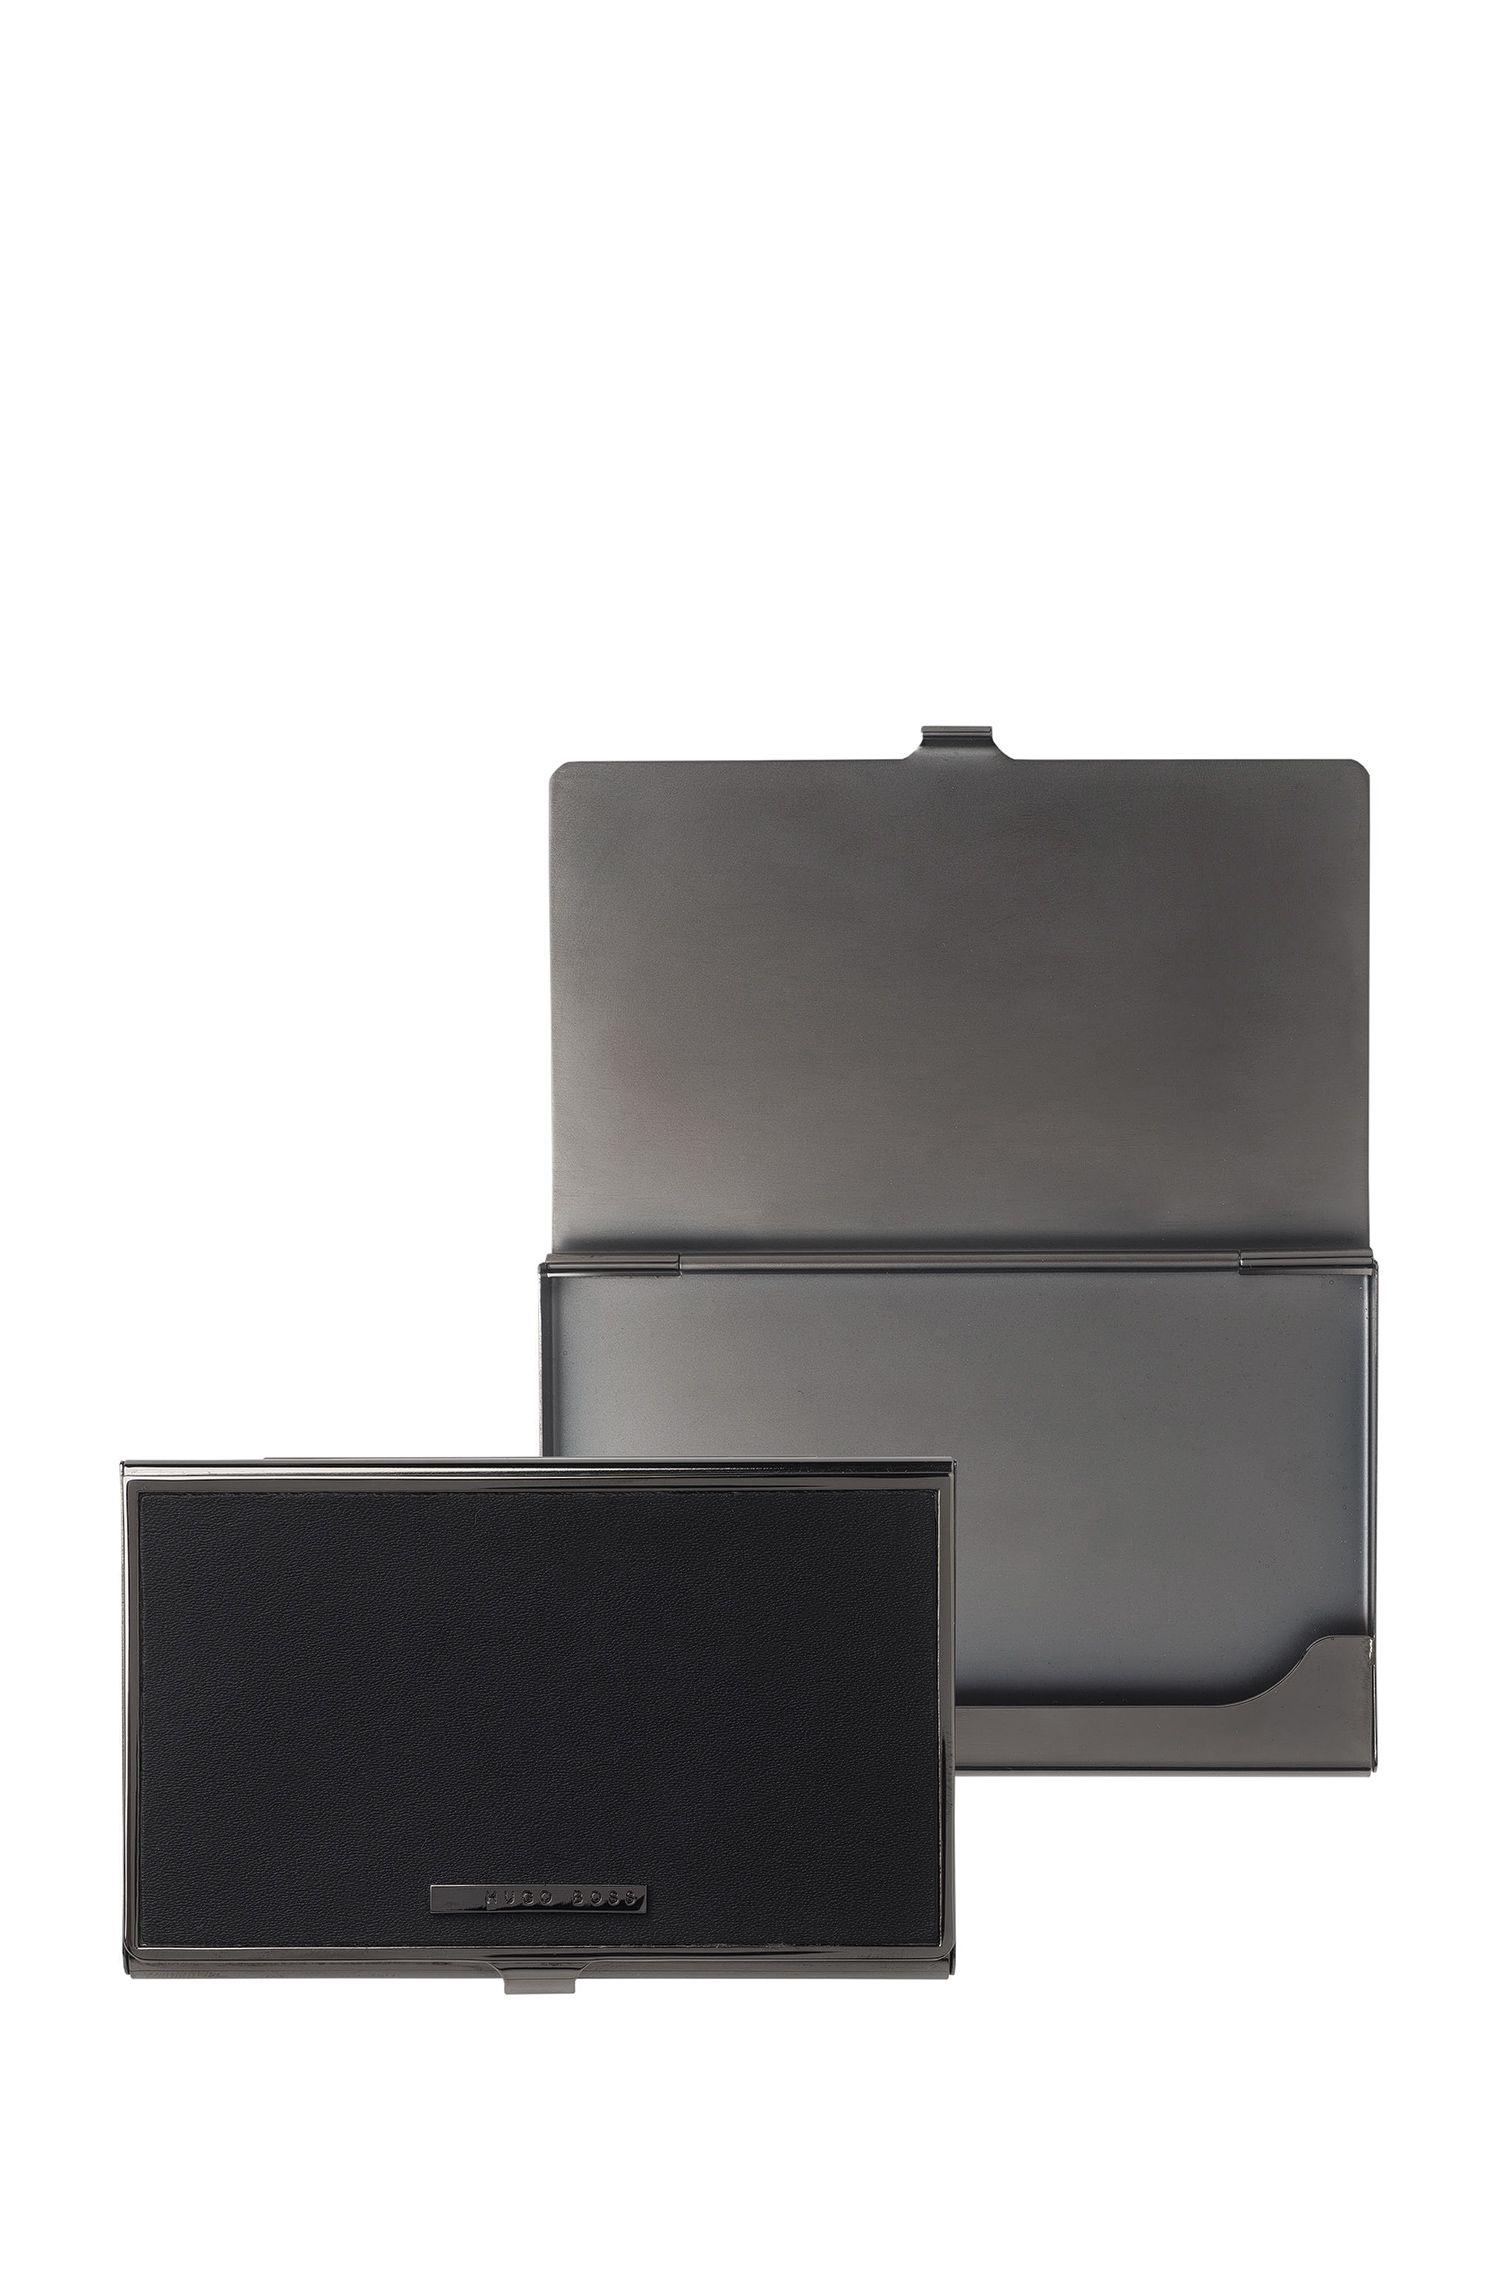 Portacarte in pelle nera e acciaio